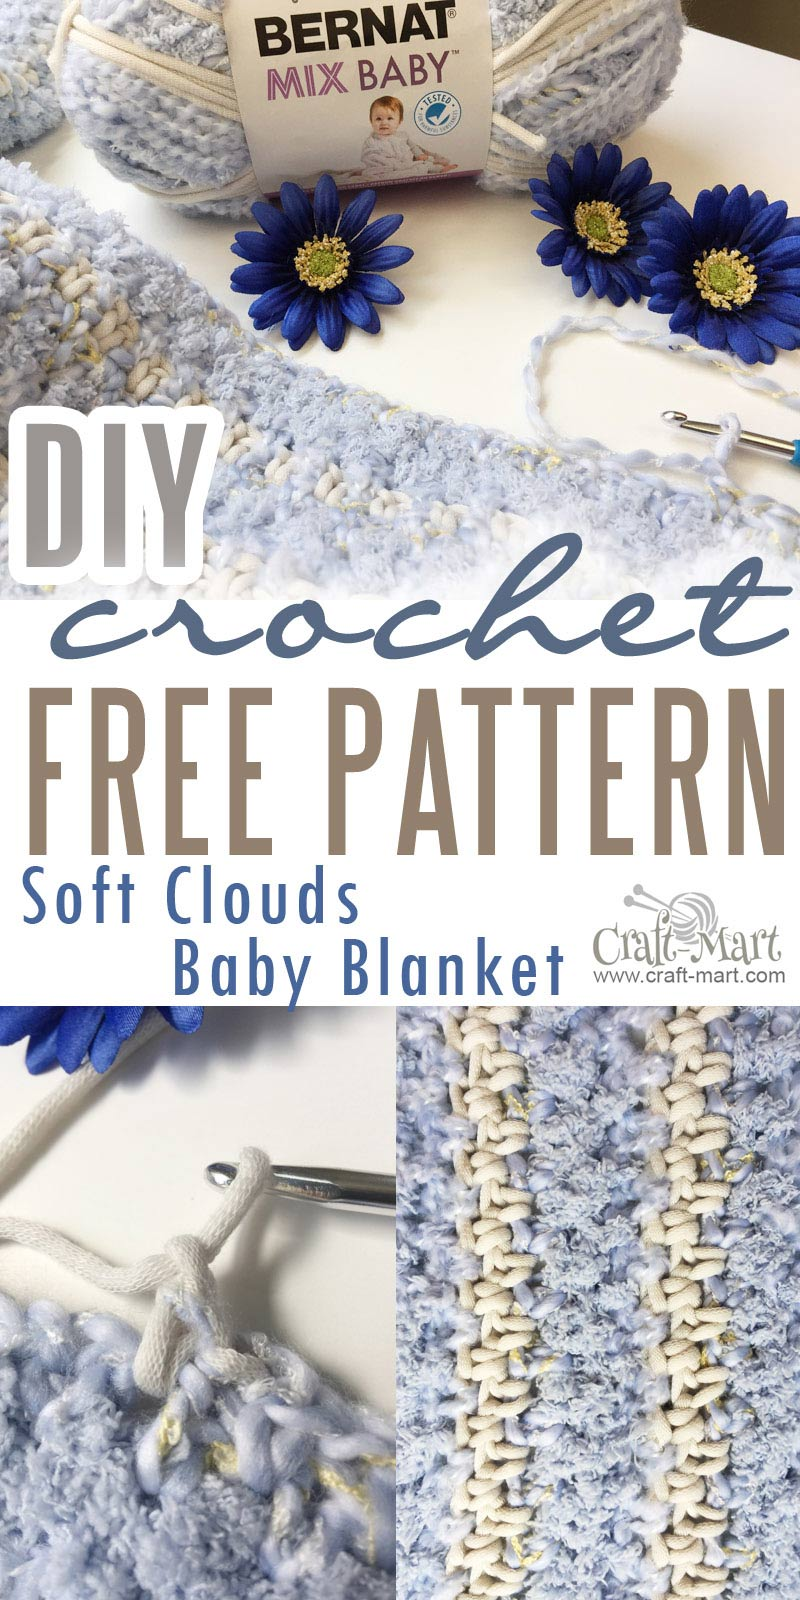 Easy Diy Crochet Baby Blanket Pattern Soft Clouds Craft Mart